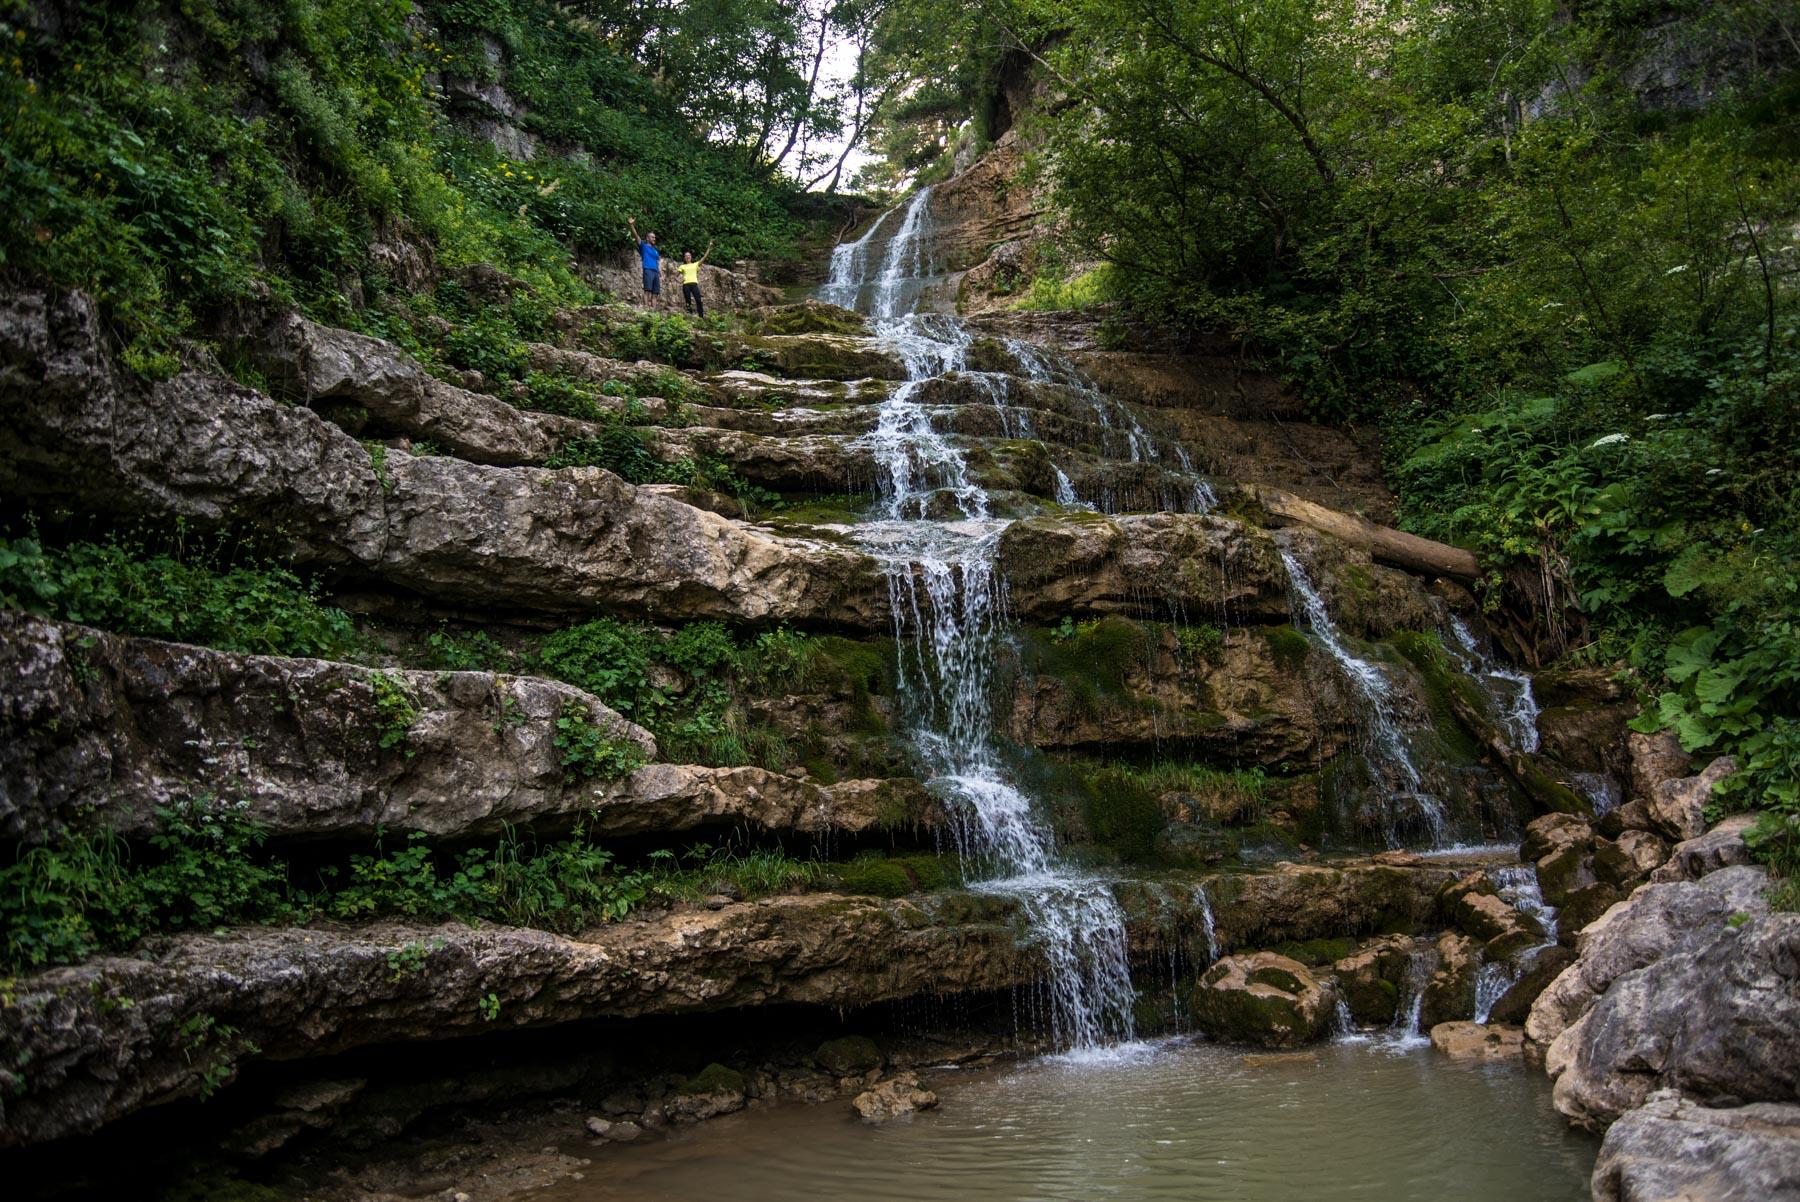 Каскадный водопад, Лаго-Наки